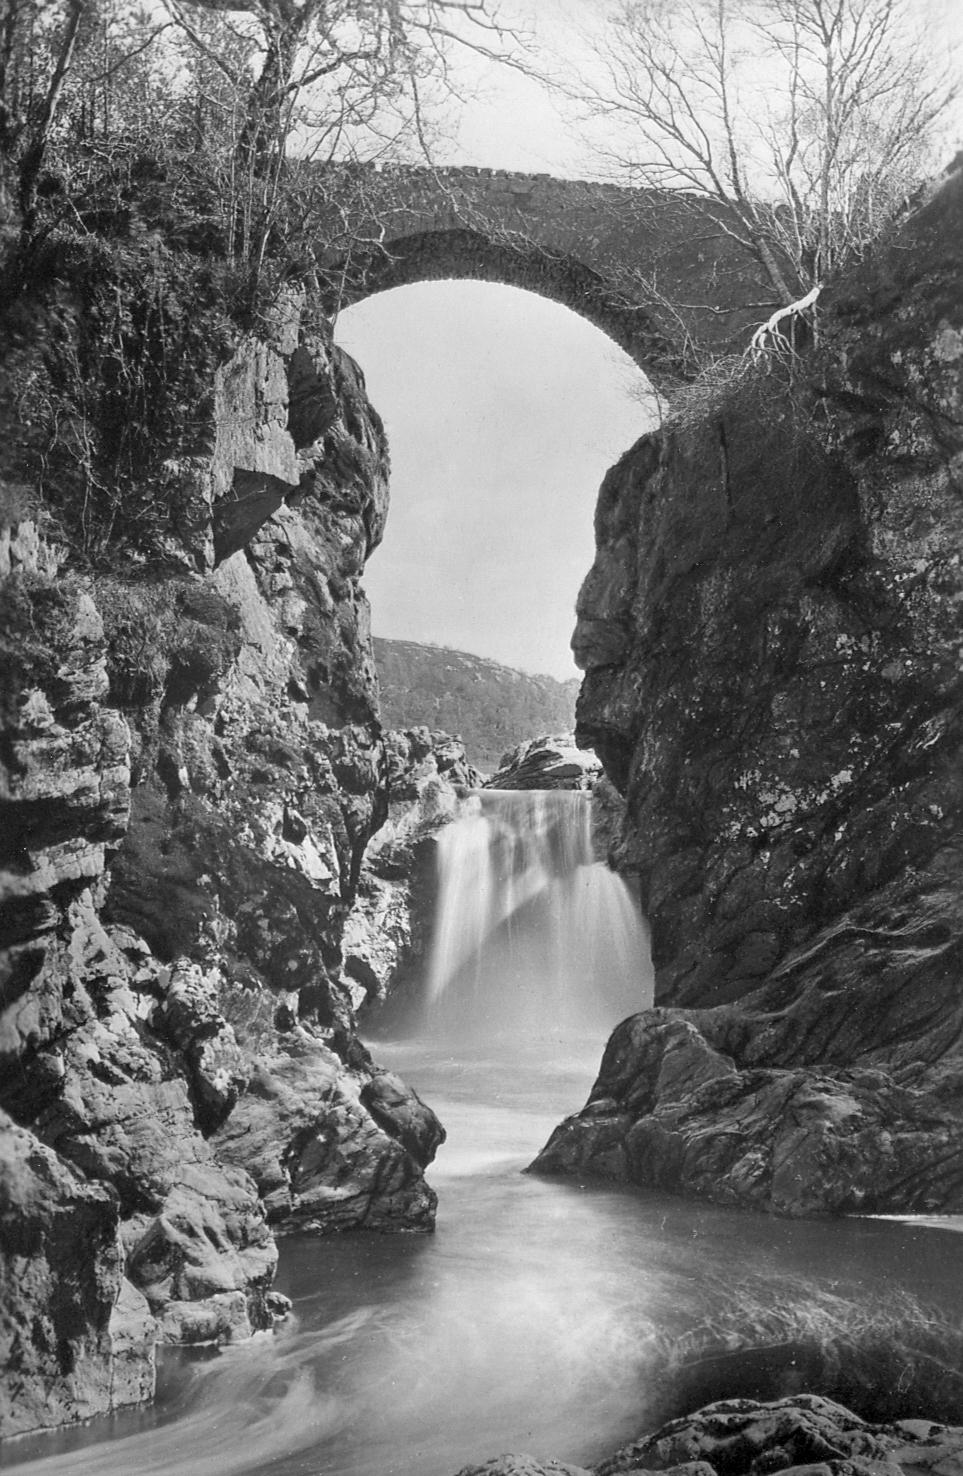 Upper Falls Bridge Glenlia Foyers  Photograph courtesy of Alister Chisholm